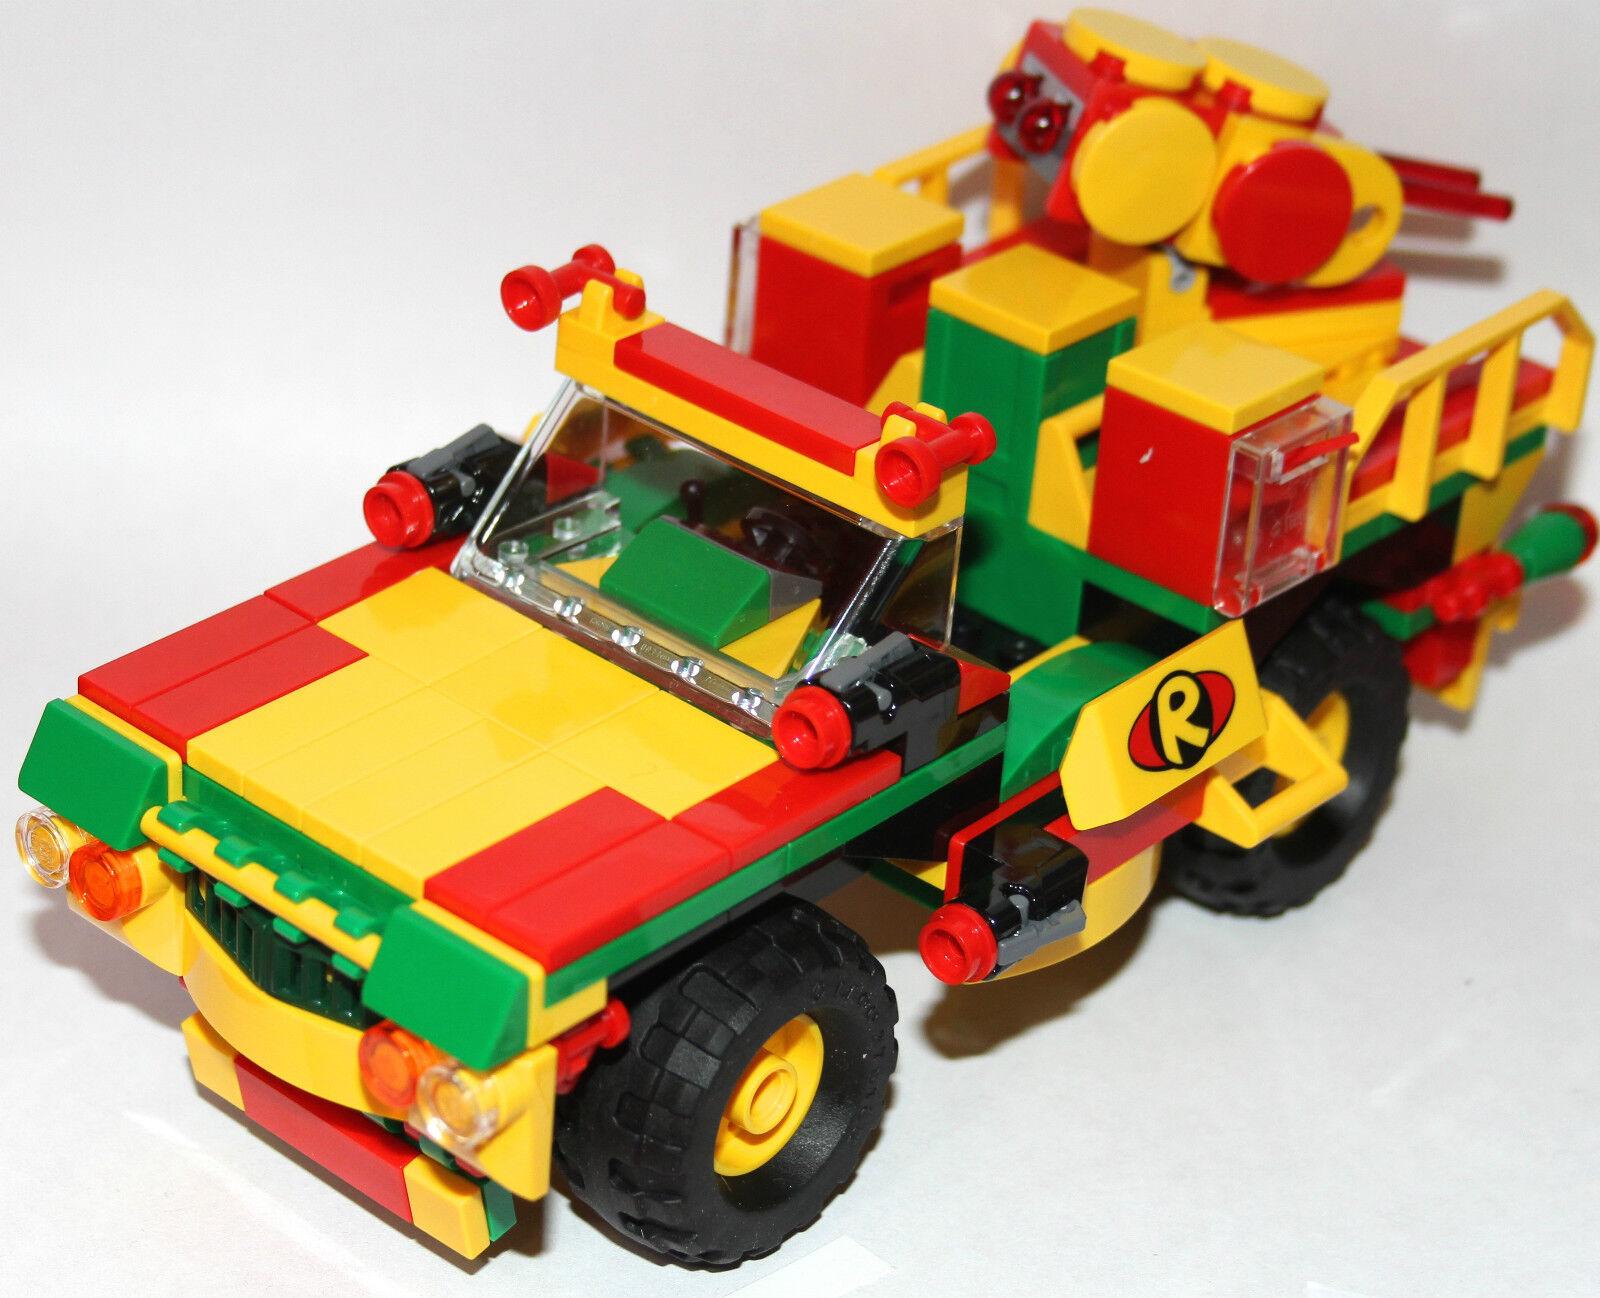 Lego original parts - ROBIN'S CANNON CAR - my design - GOTHAM CITY